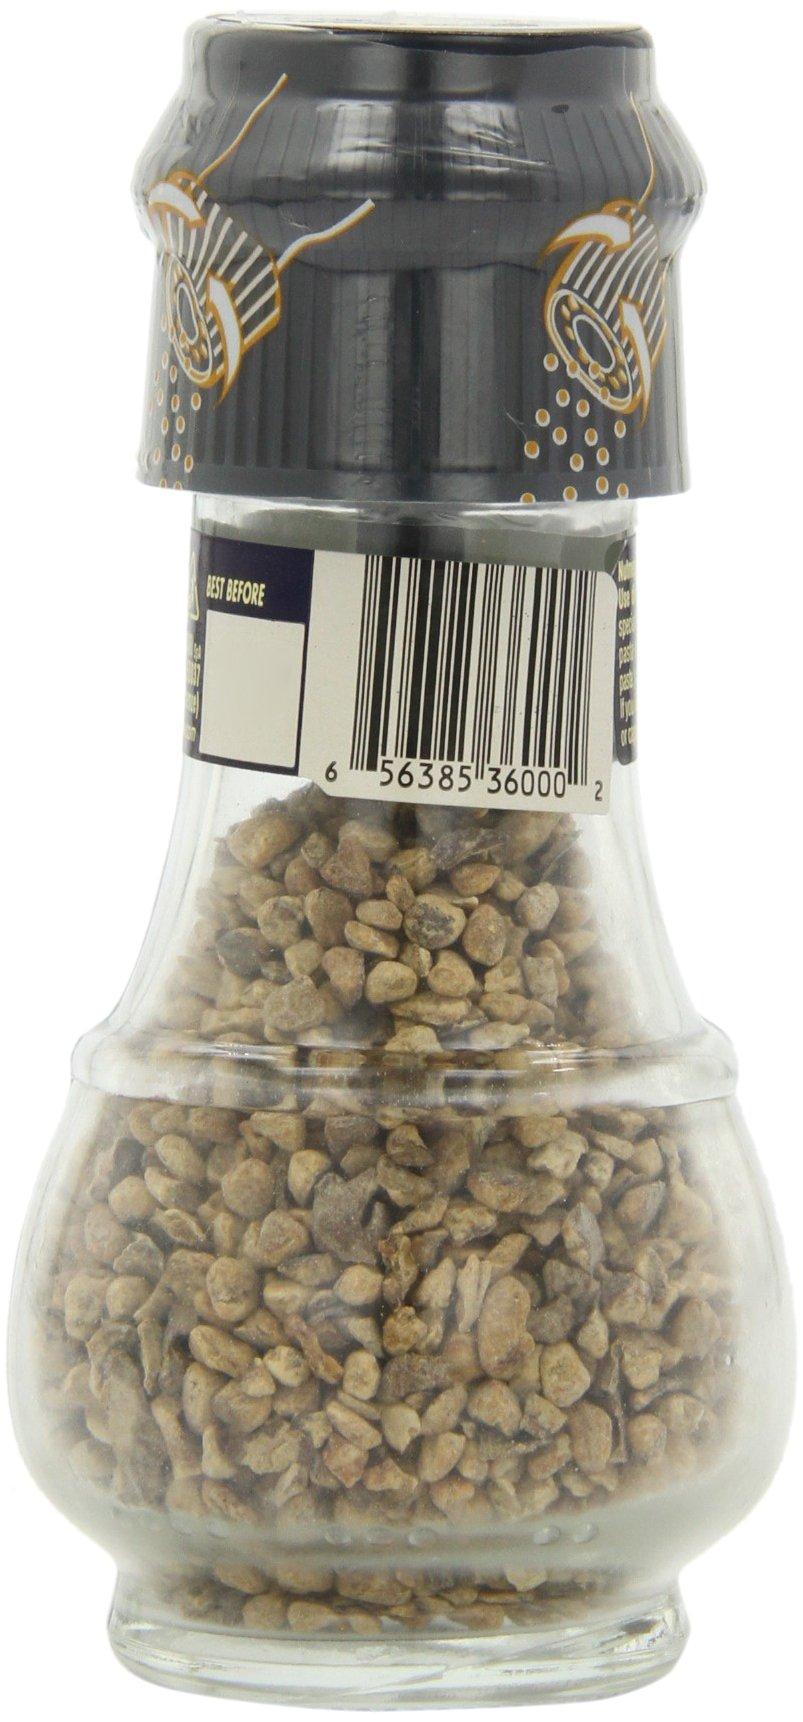 Drogheria & Alimentari All Natural Spice Grinder Nutmeg, 1.41-Ounce Jars (Pack of 3) by Drogheria & Alimentari (Image #2)